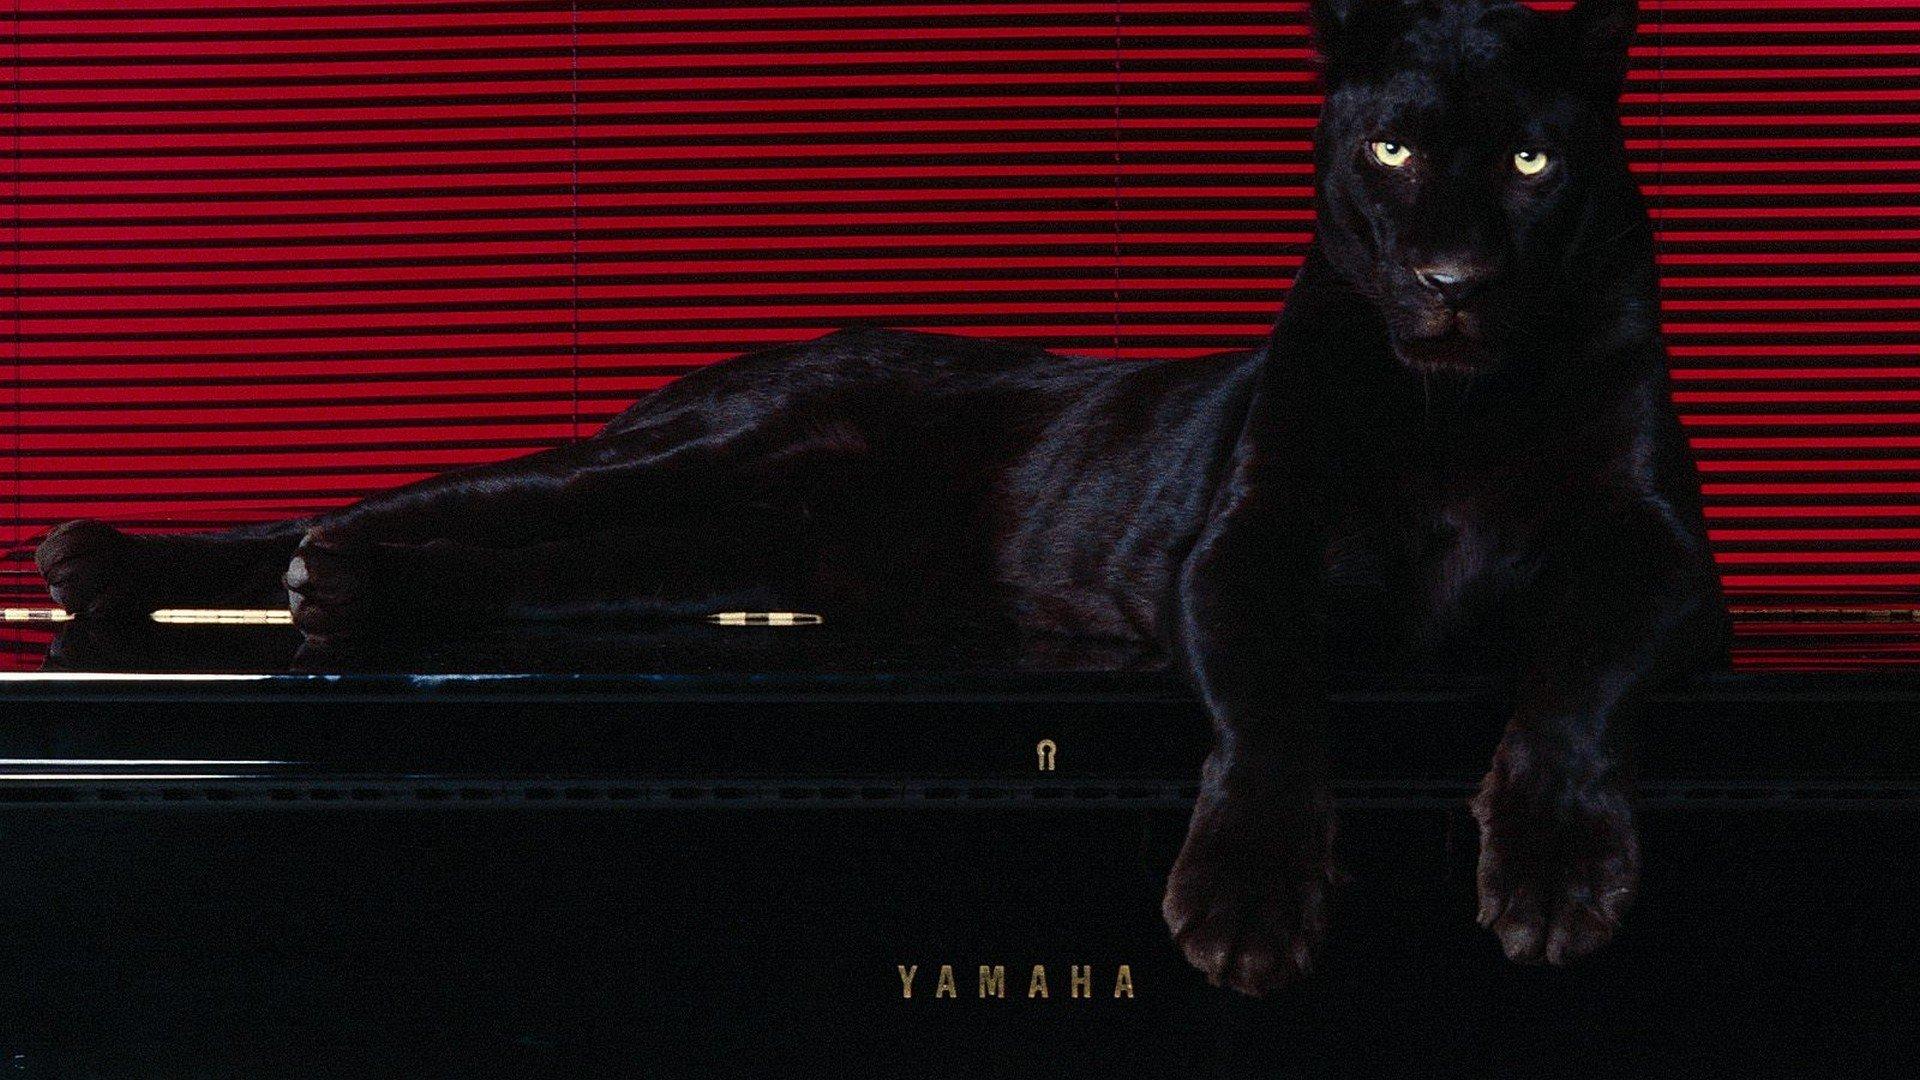 Wallpaper 1920x1080 Px Animals Pantera Puma 1920x1080